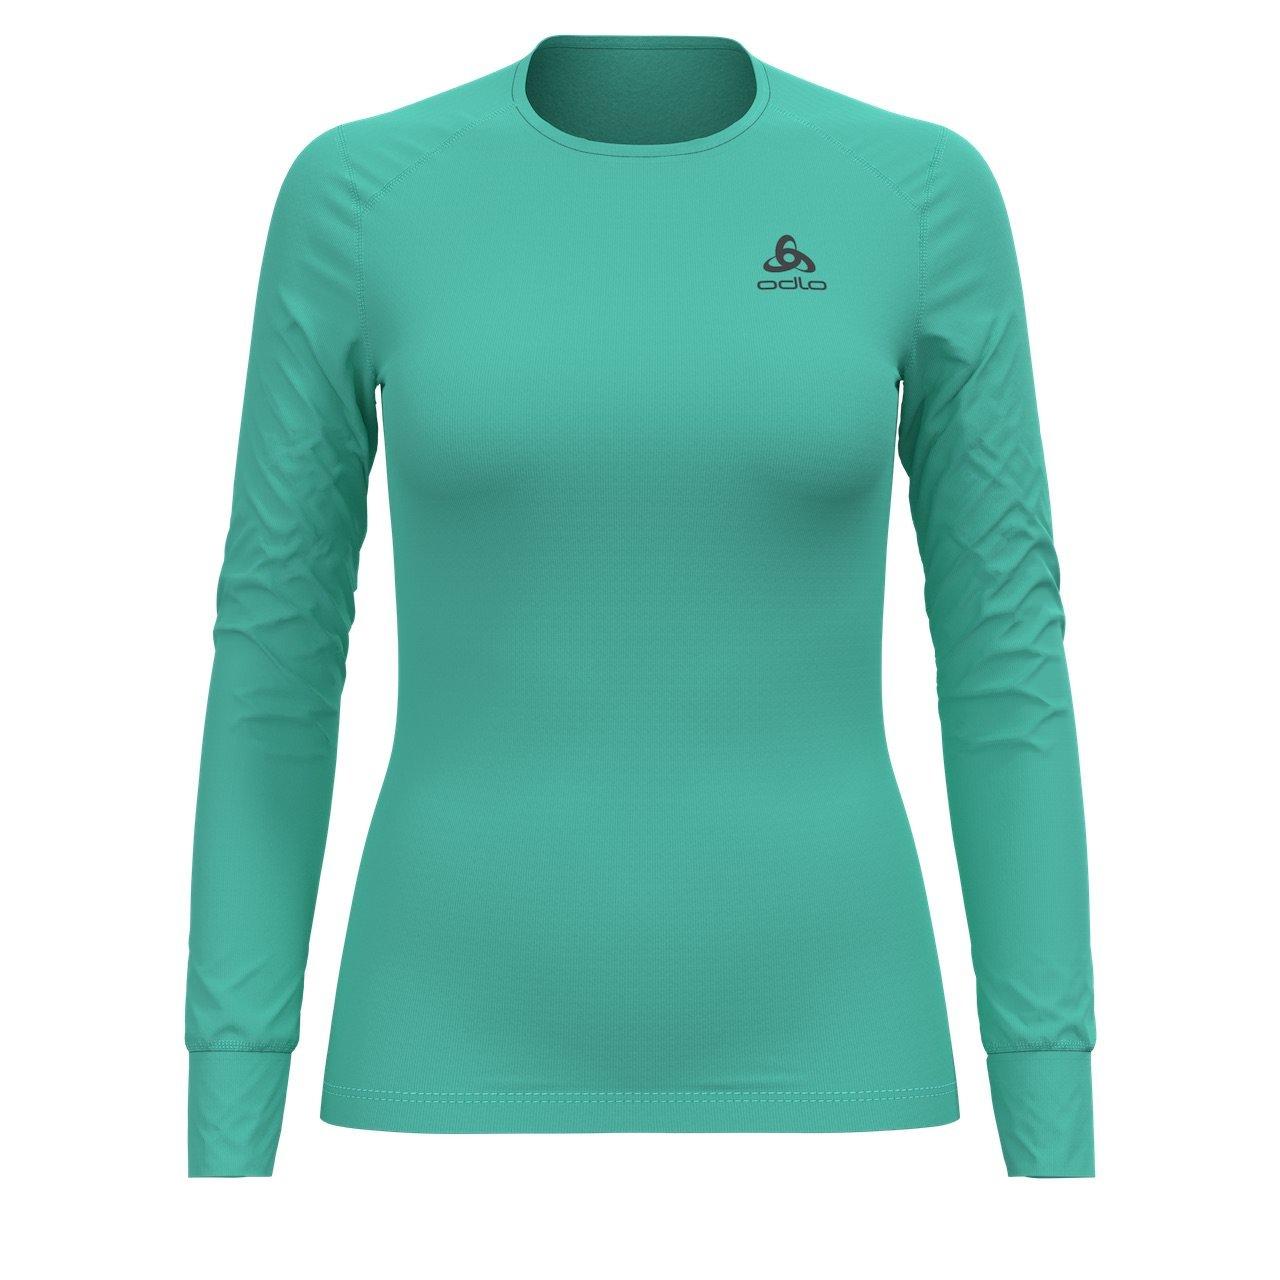 Actice Warm Eco Shirt ws_159101_40157_A